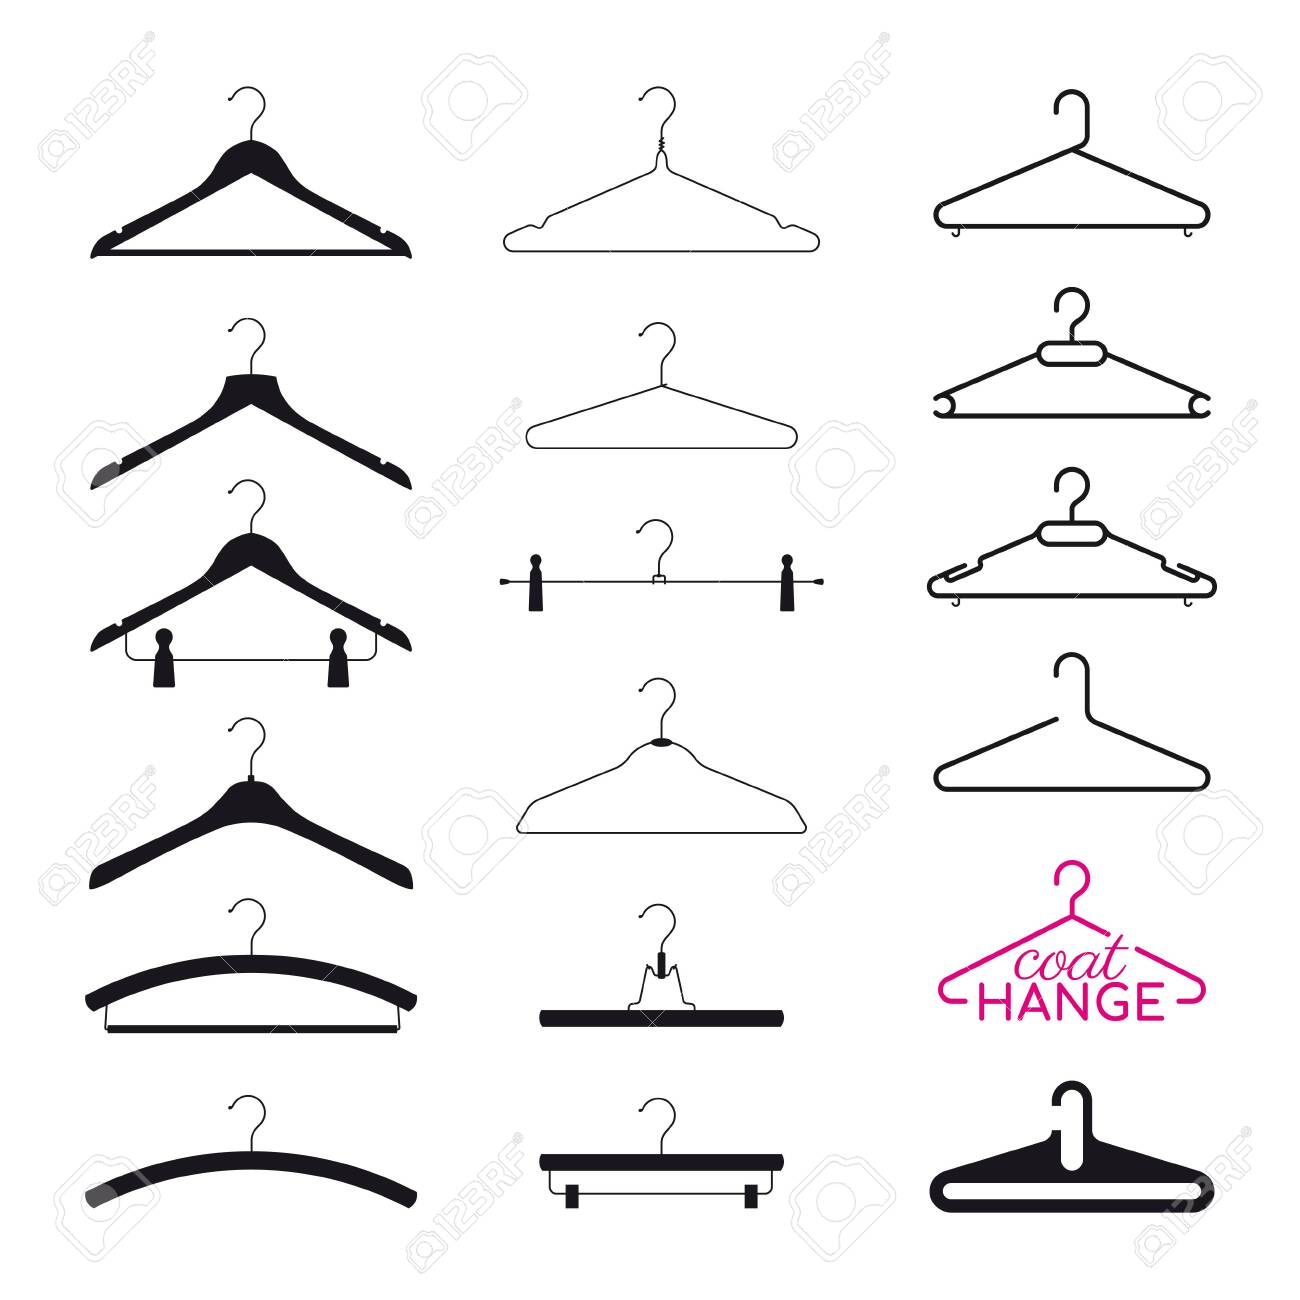 Vector set silhouette coat hanger. Isolated on white background - 145838468